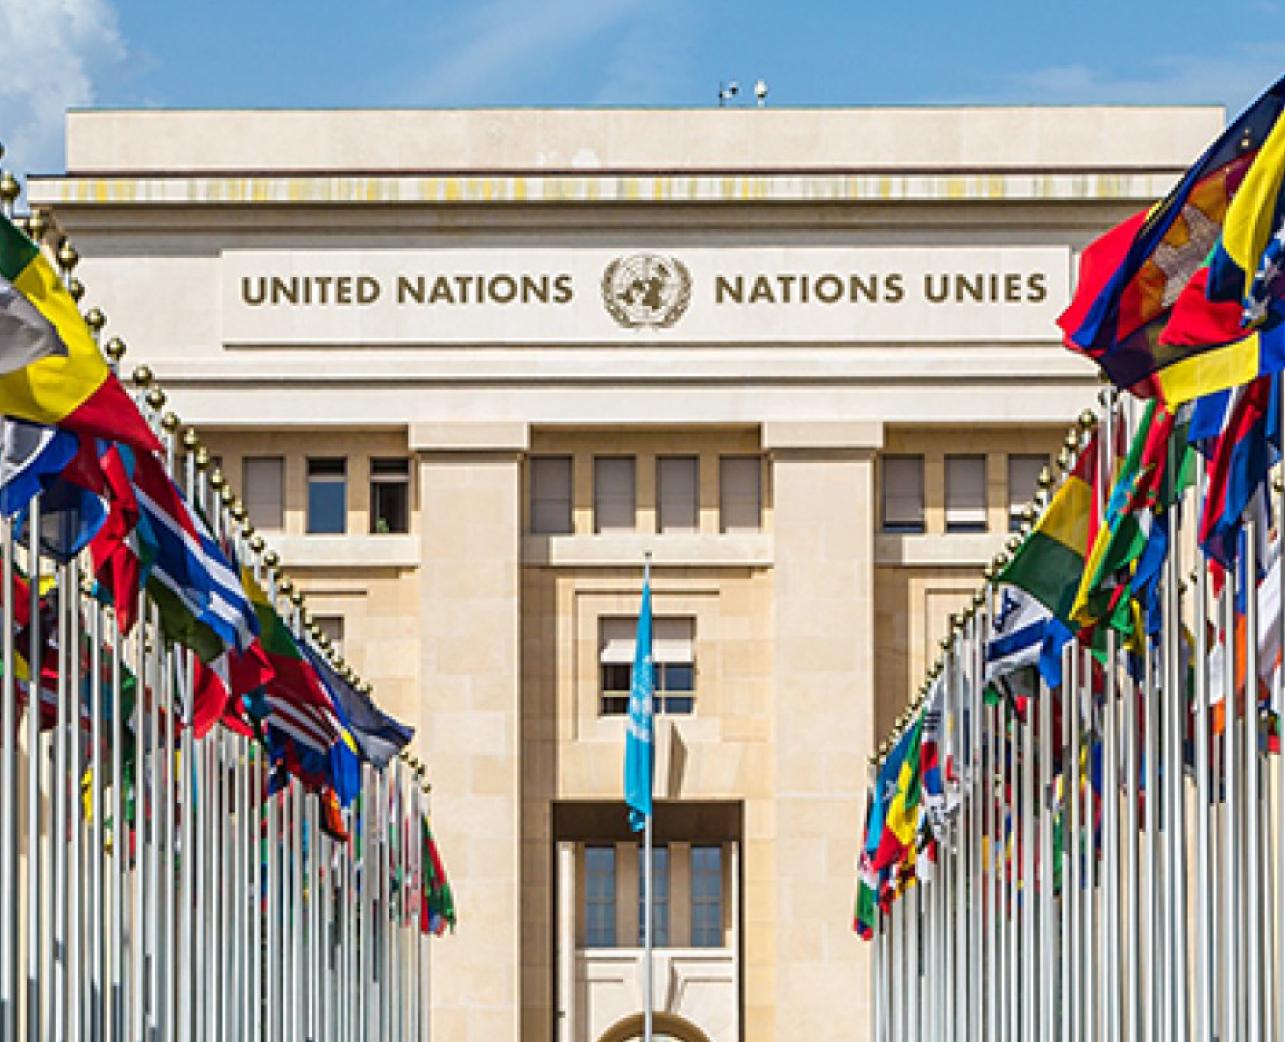 United Nations Association (UNA)